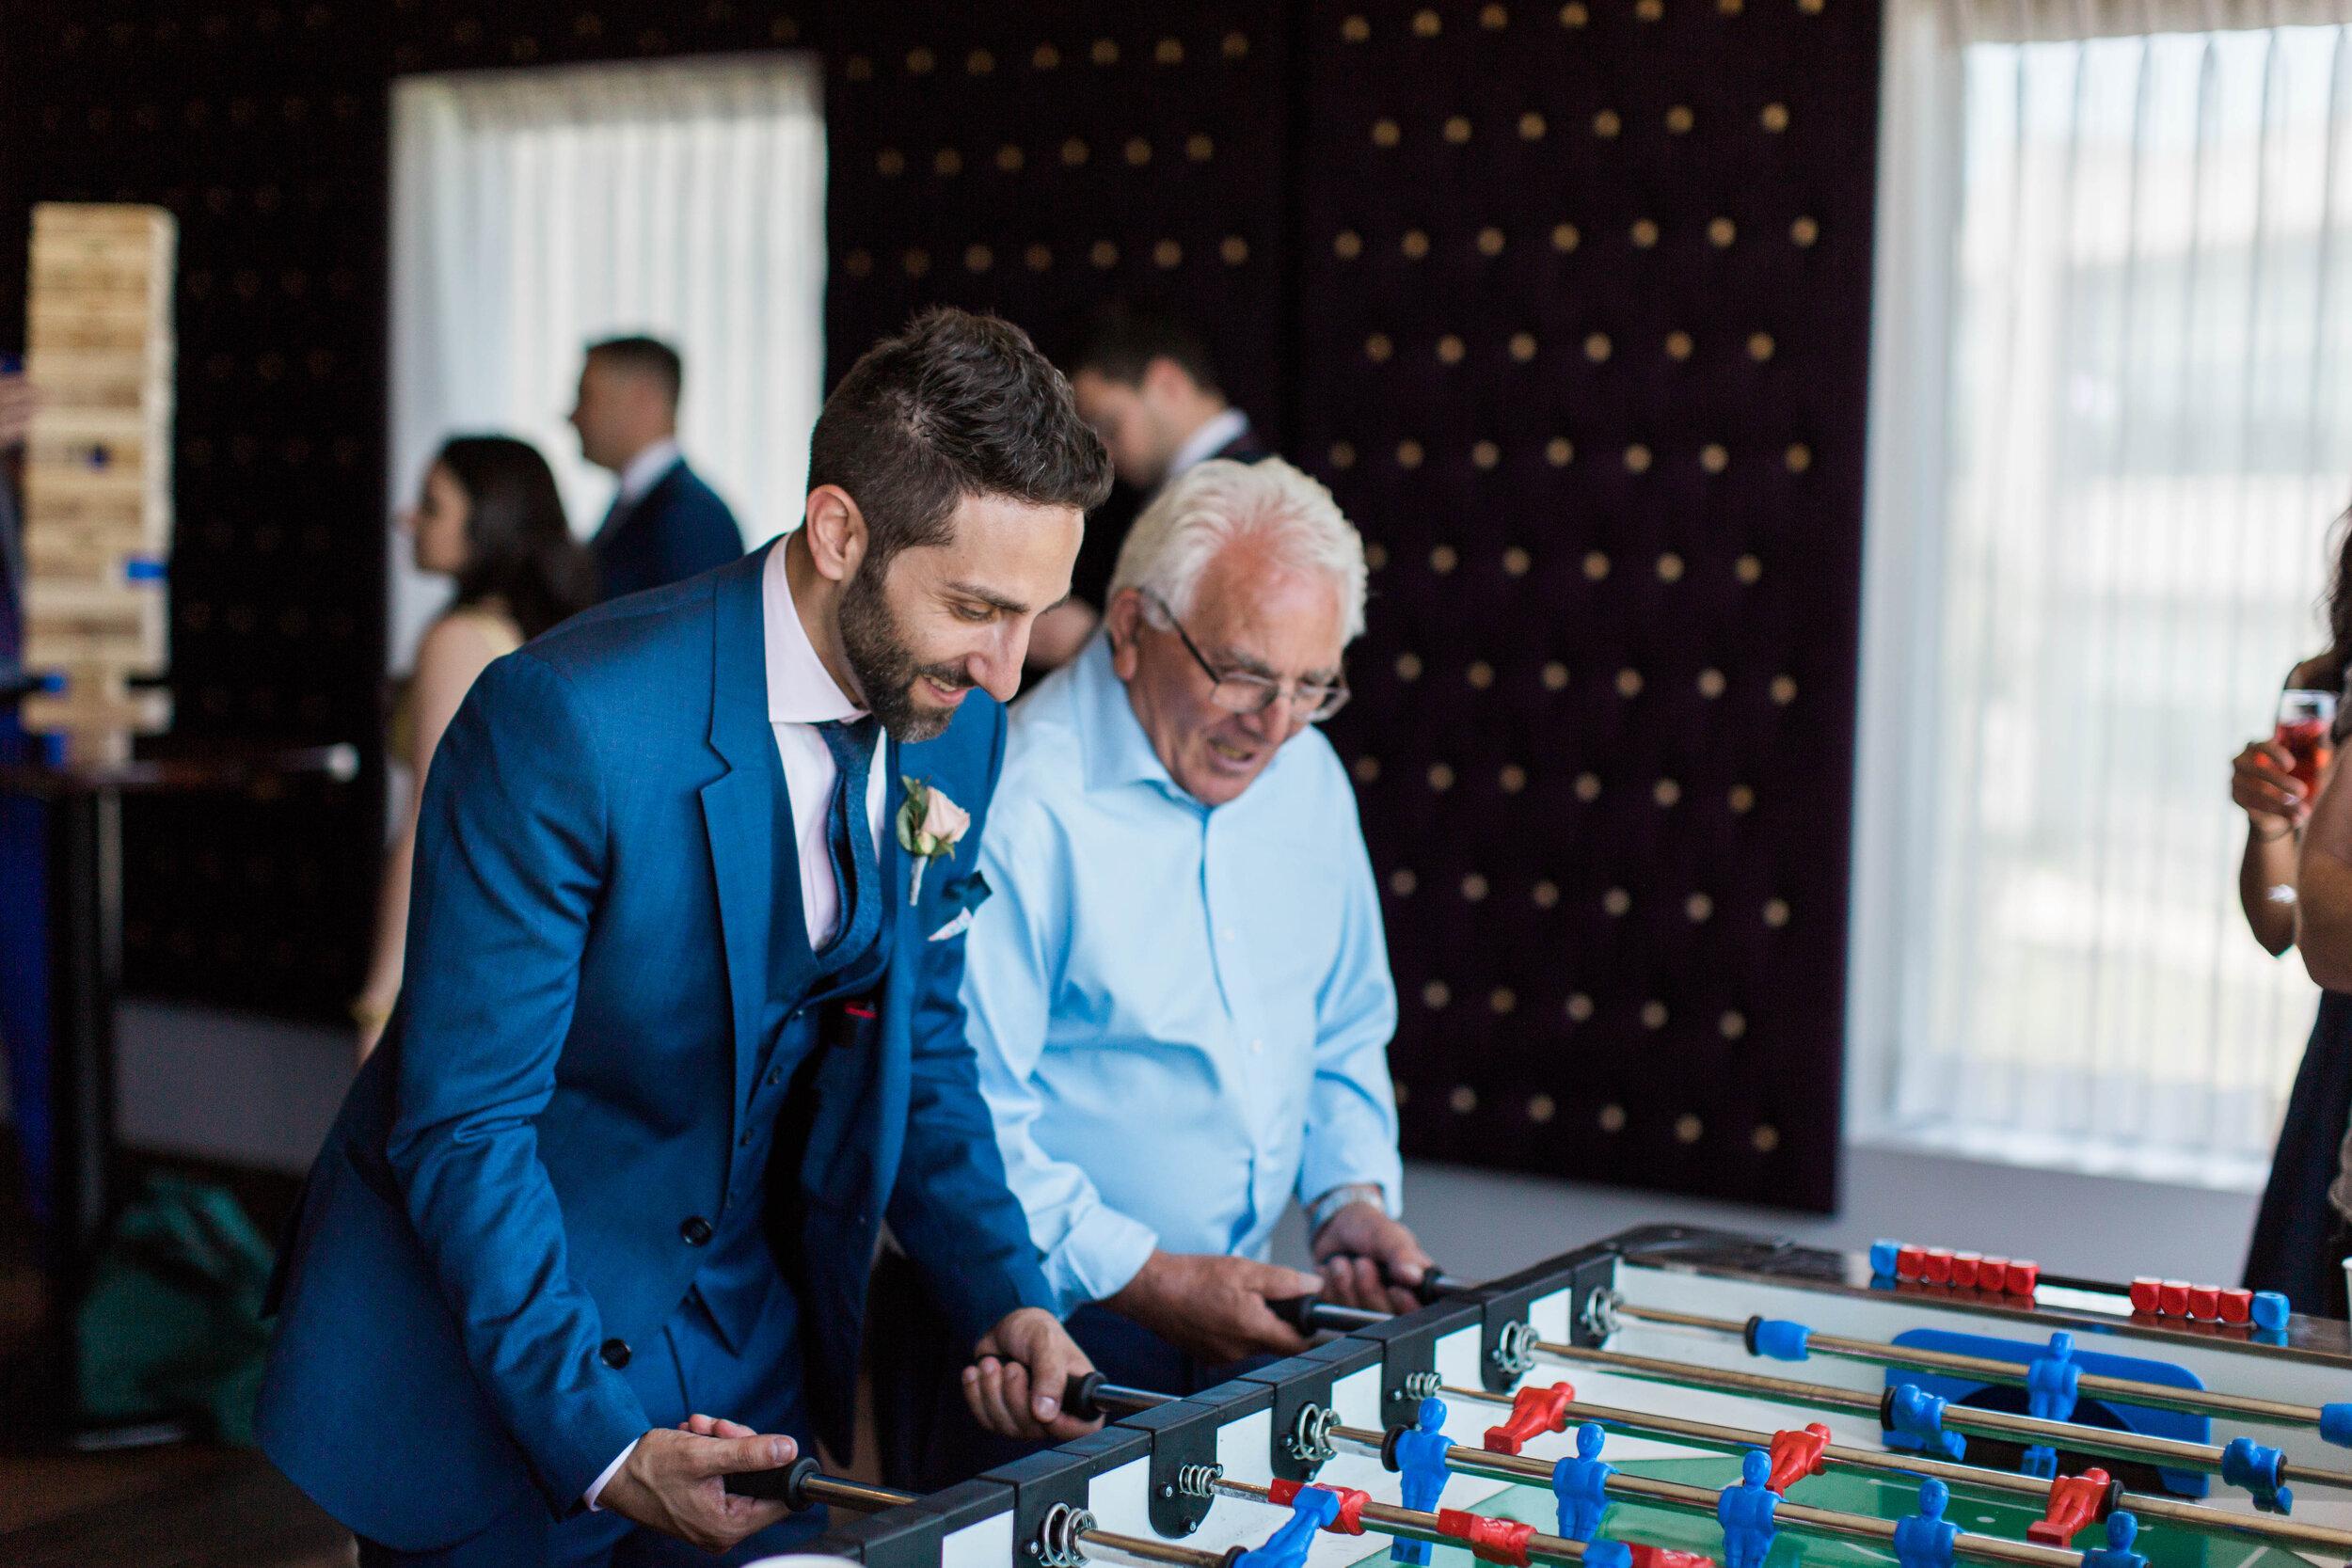 Groom Playing Foosball - Trendy Modern Brunch Wedding - Historia Wedding and Event Planning